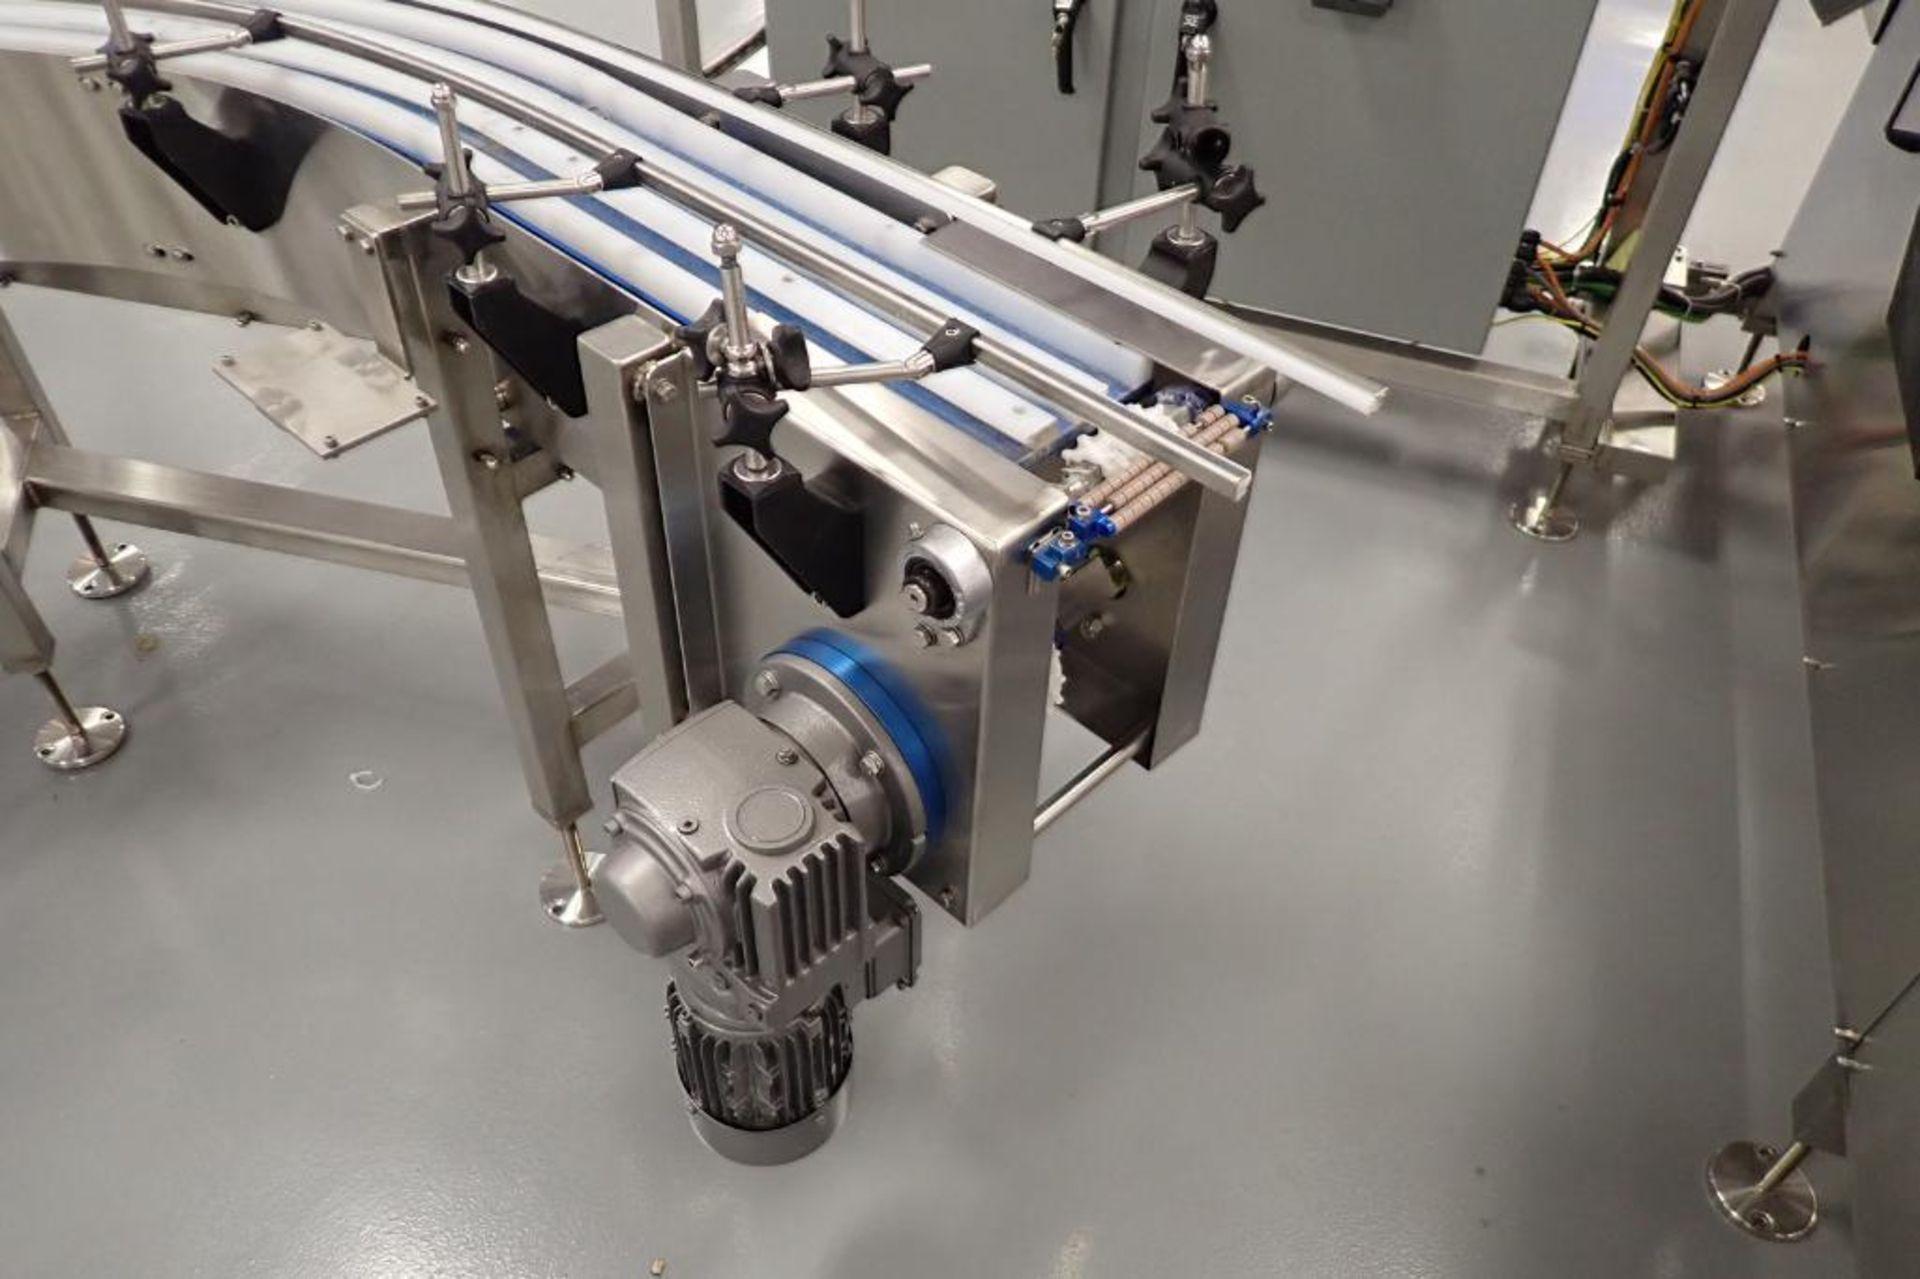 Lot 7 - FEMC 90 degree S turn conveyor, approximately 10 in .wide, overall 120 in. long x 94 in. wide, motor